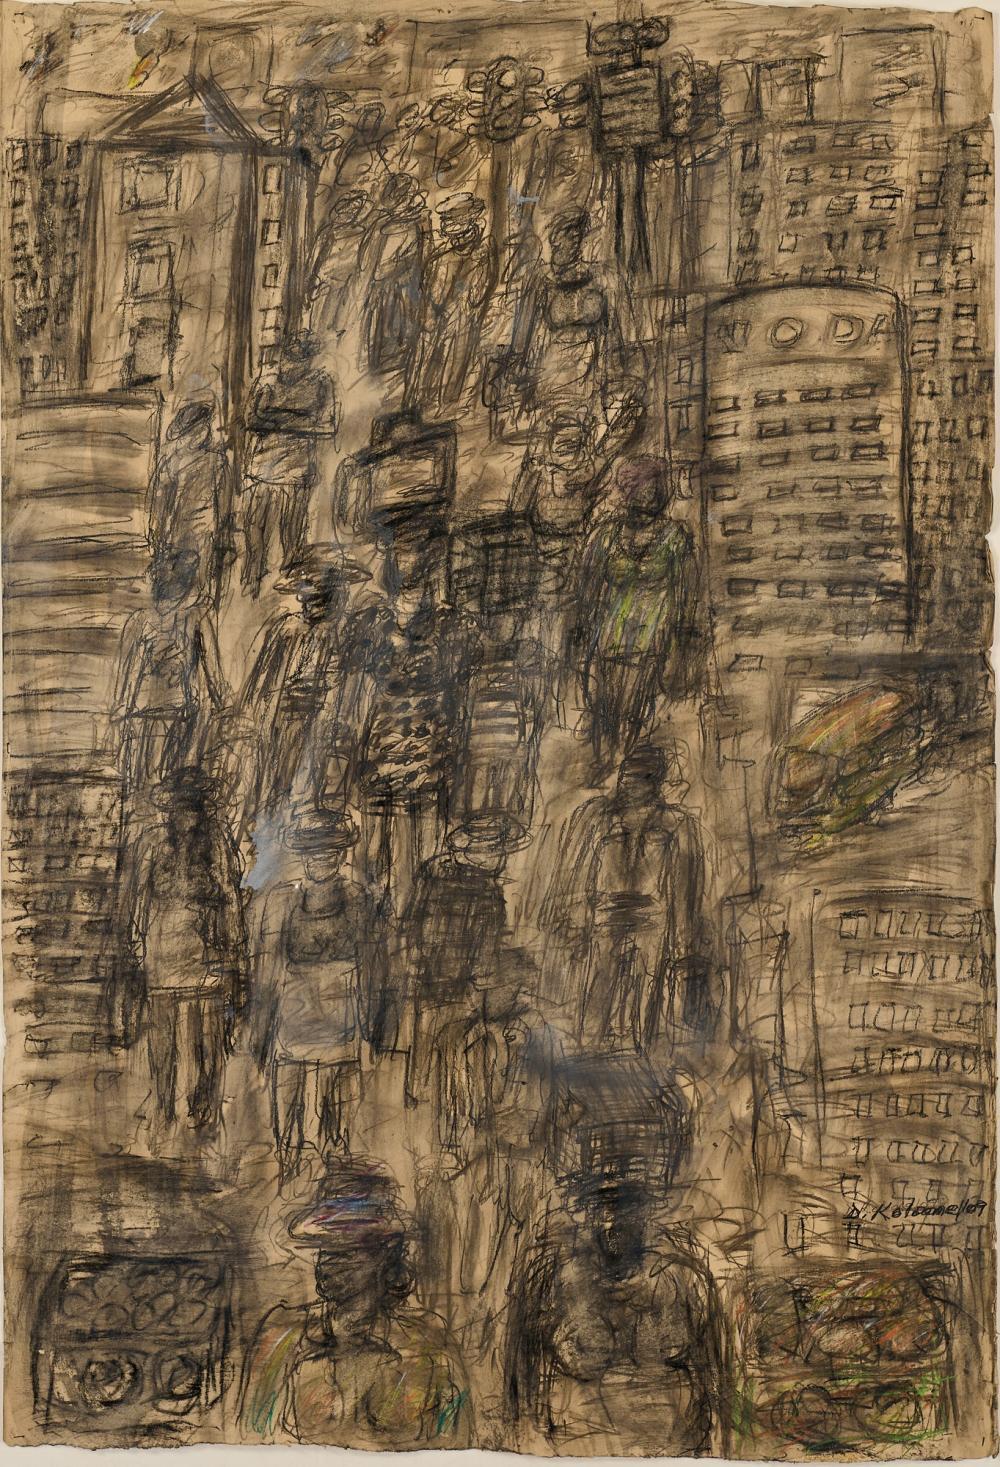 DAVID KOLOANE (SOUTH AFRICA 1938-2019) JOHANNESBURG CITYSCAPE